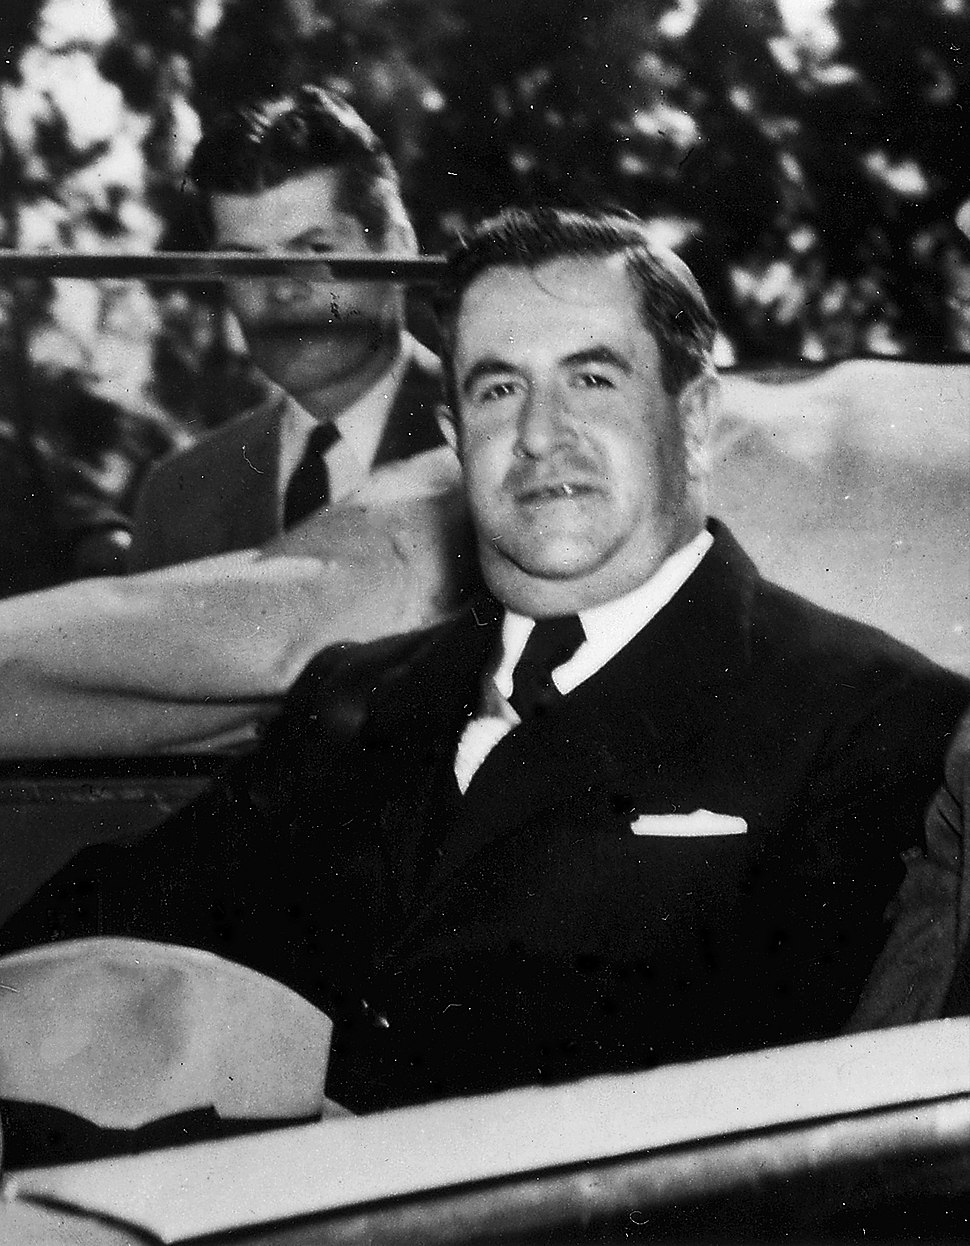 Mexican President Avila Camacho in Monterrey, Mexico - NARA - 196060